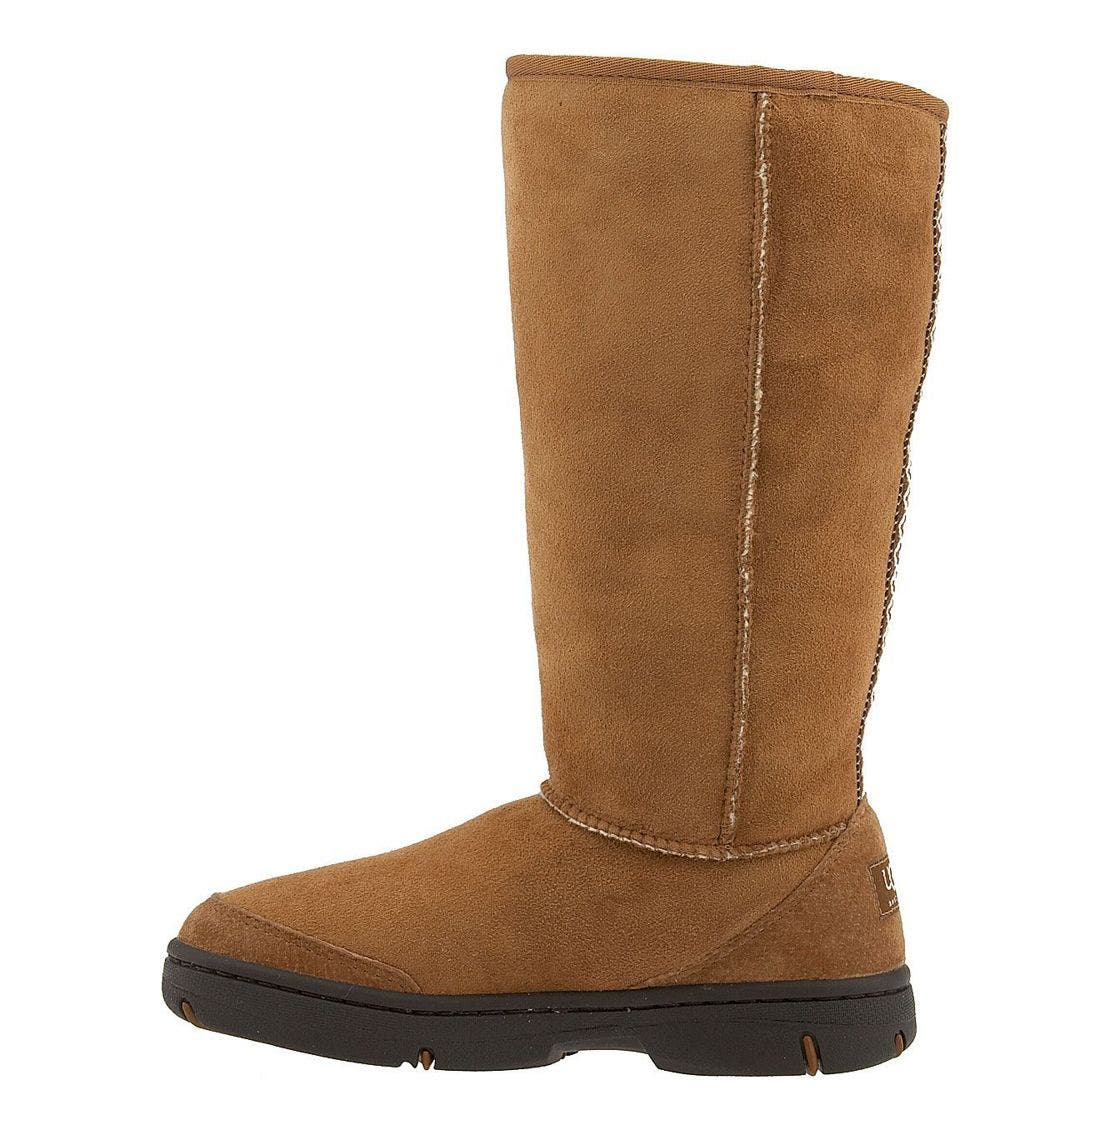 Alternate Image 2  - UGG® Australia 'Ultimate Tall Braid' Boot (Women)